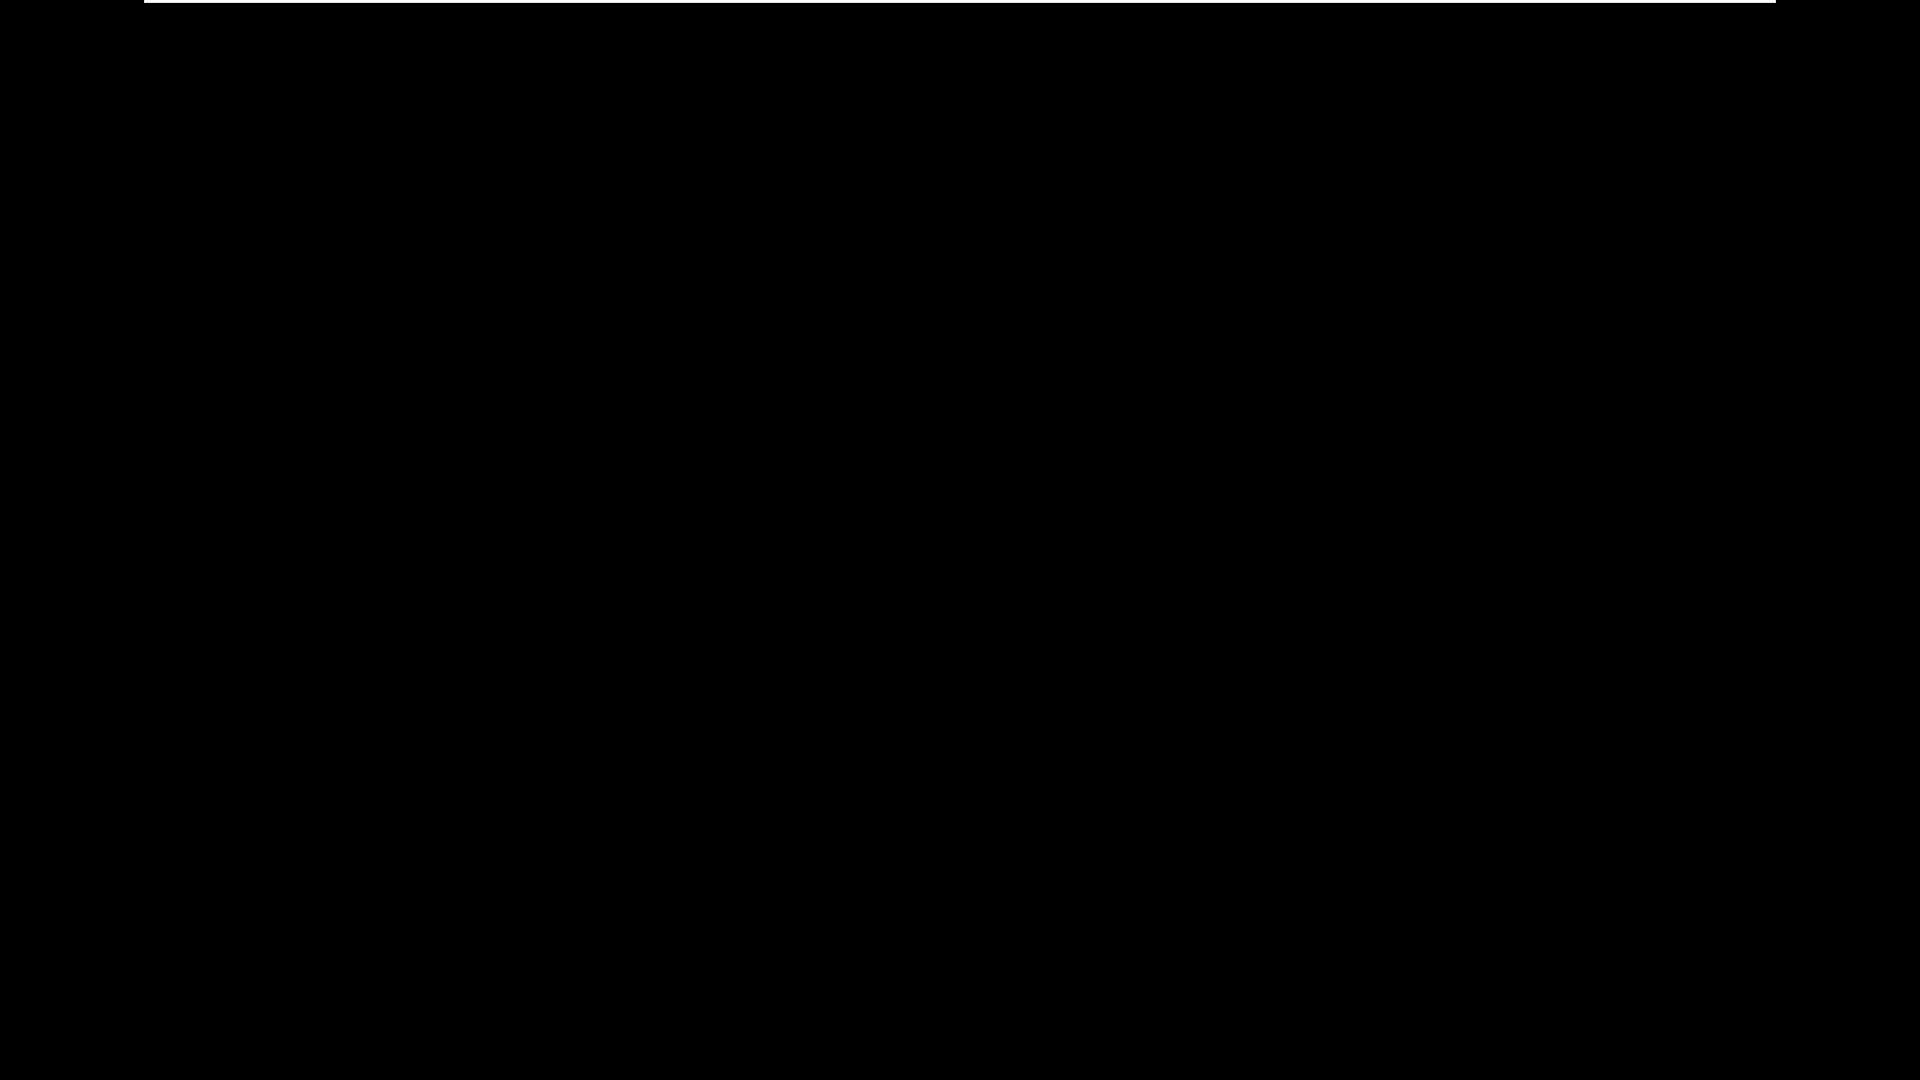 TmaxOS 설치 테스트 - 2번째 시도 - 이번에는 윈도에서 Tmax에서 제공한 T-Up TmaxOS.exe 으로 멀티 부팅으로 설치하기 - 다른 것 하다가 왔더니 깜깜하네요. 먹통입니다 2019-08-20_222229.jpg